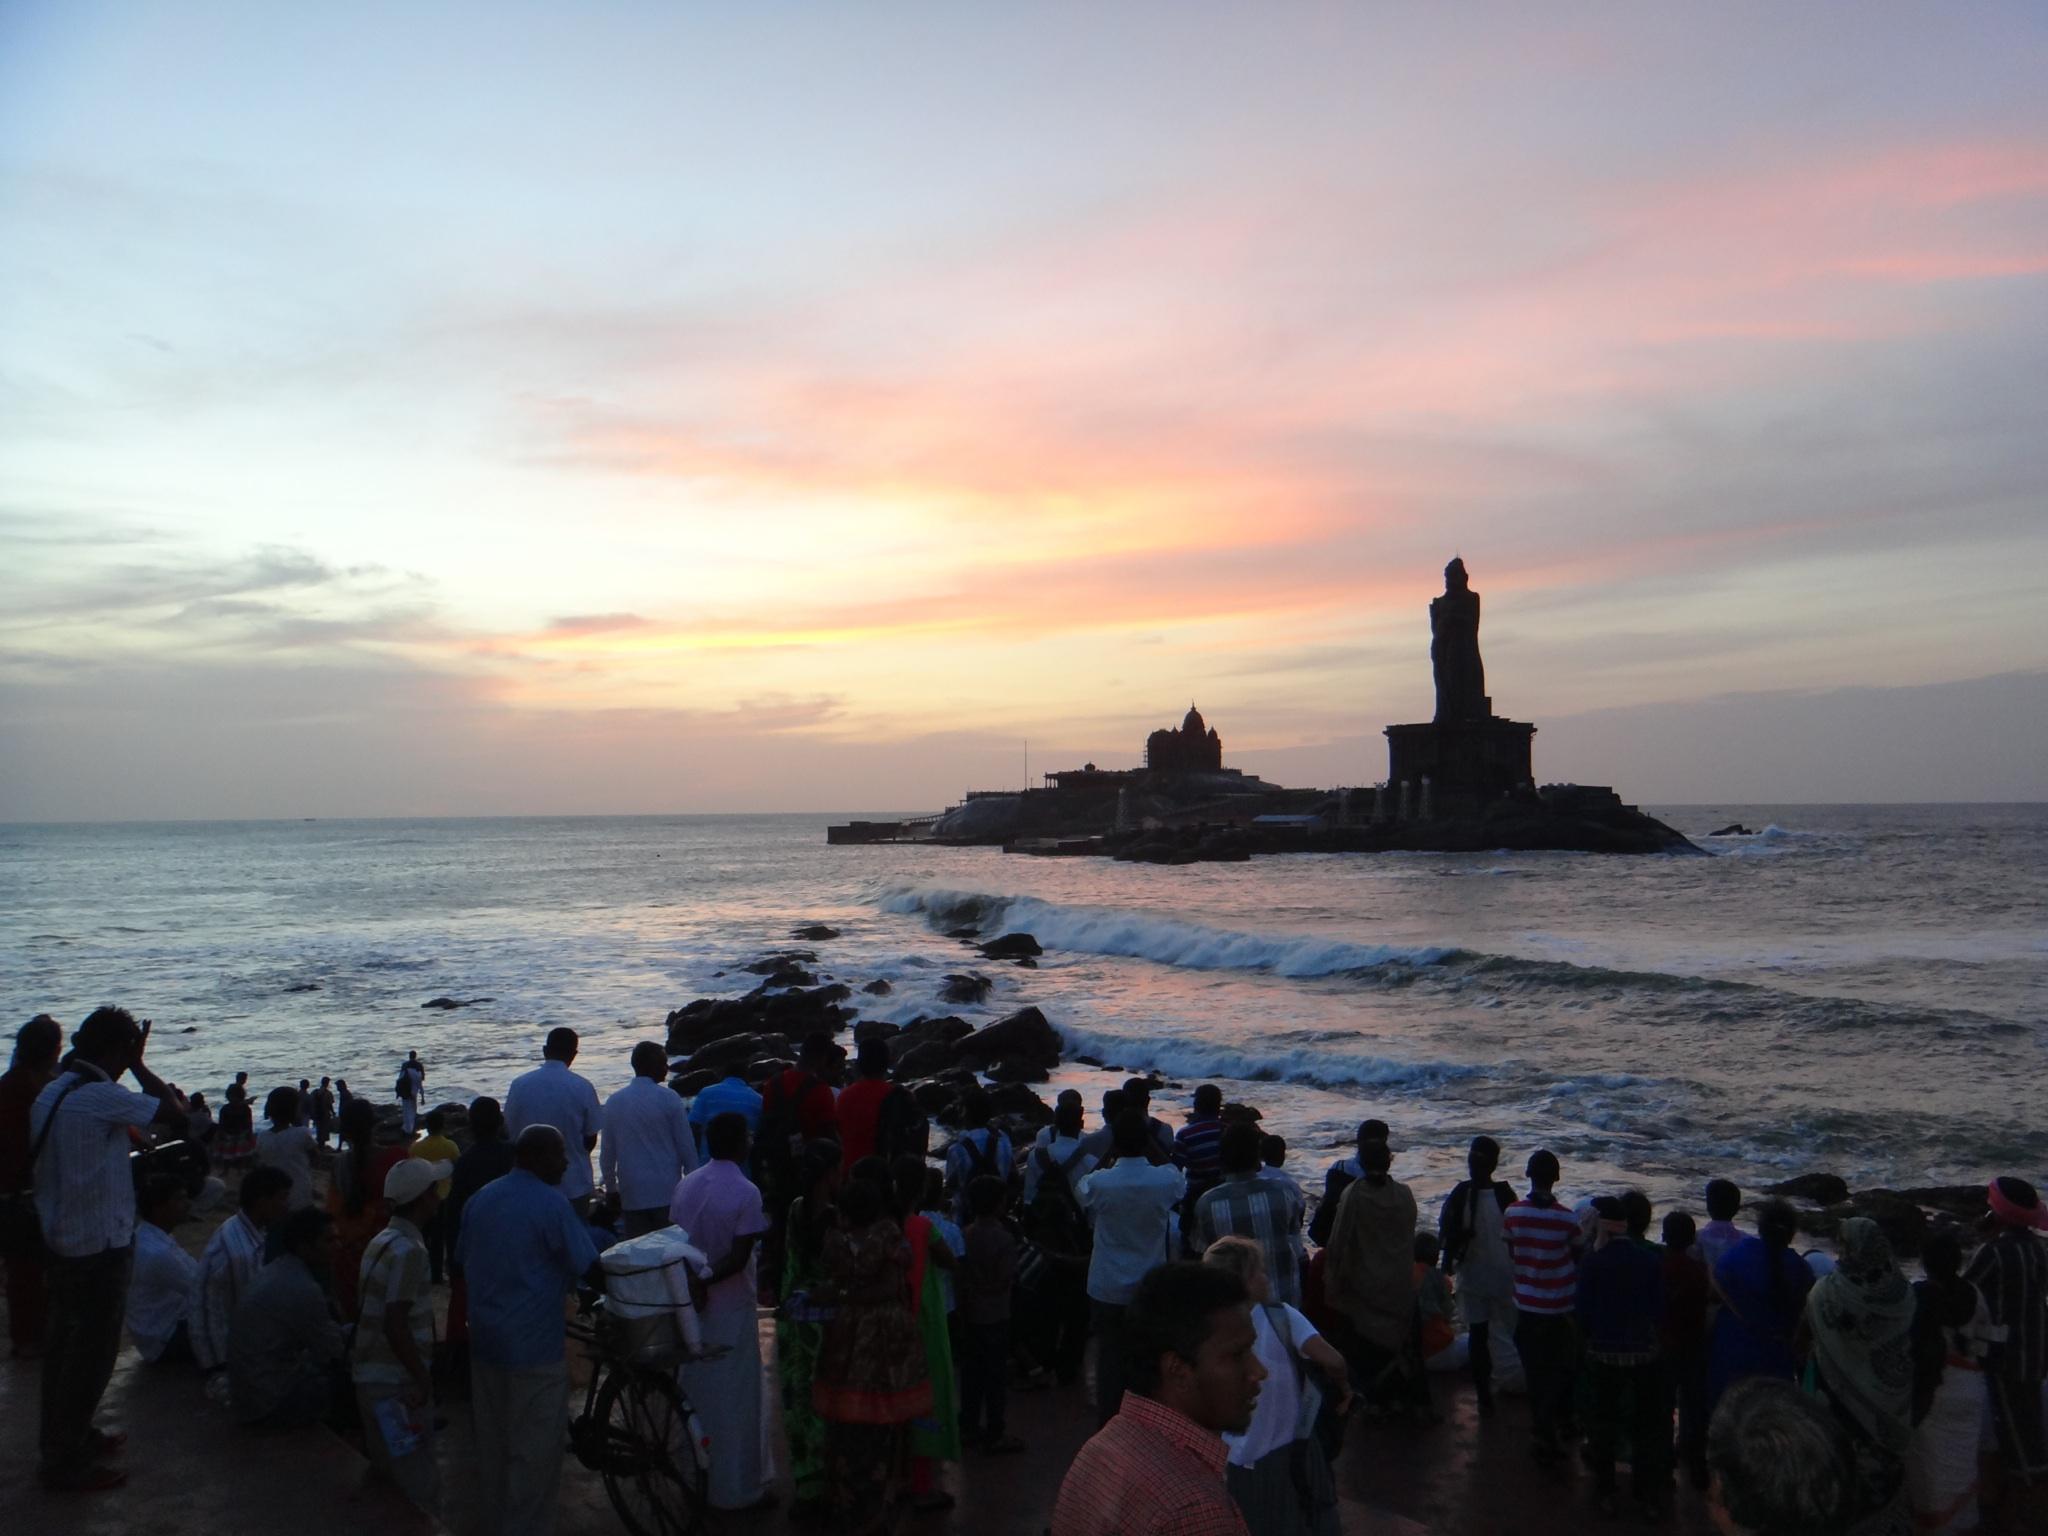 kanyakumari - india - travel - places to visit - India